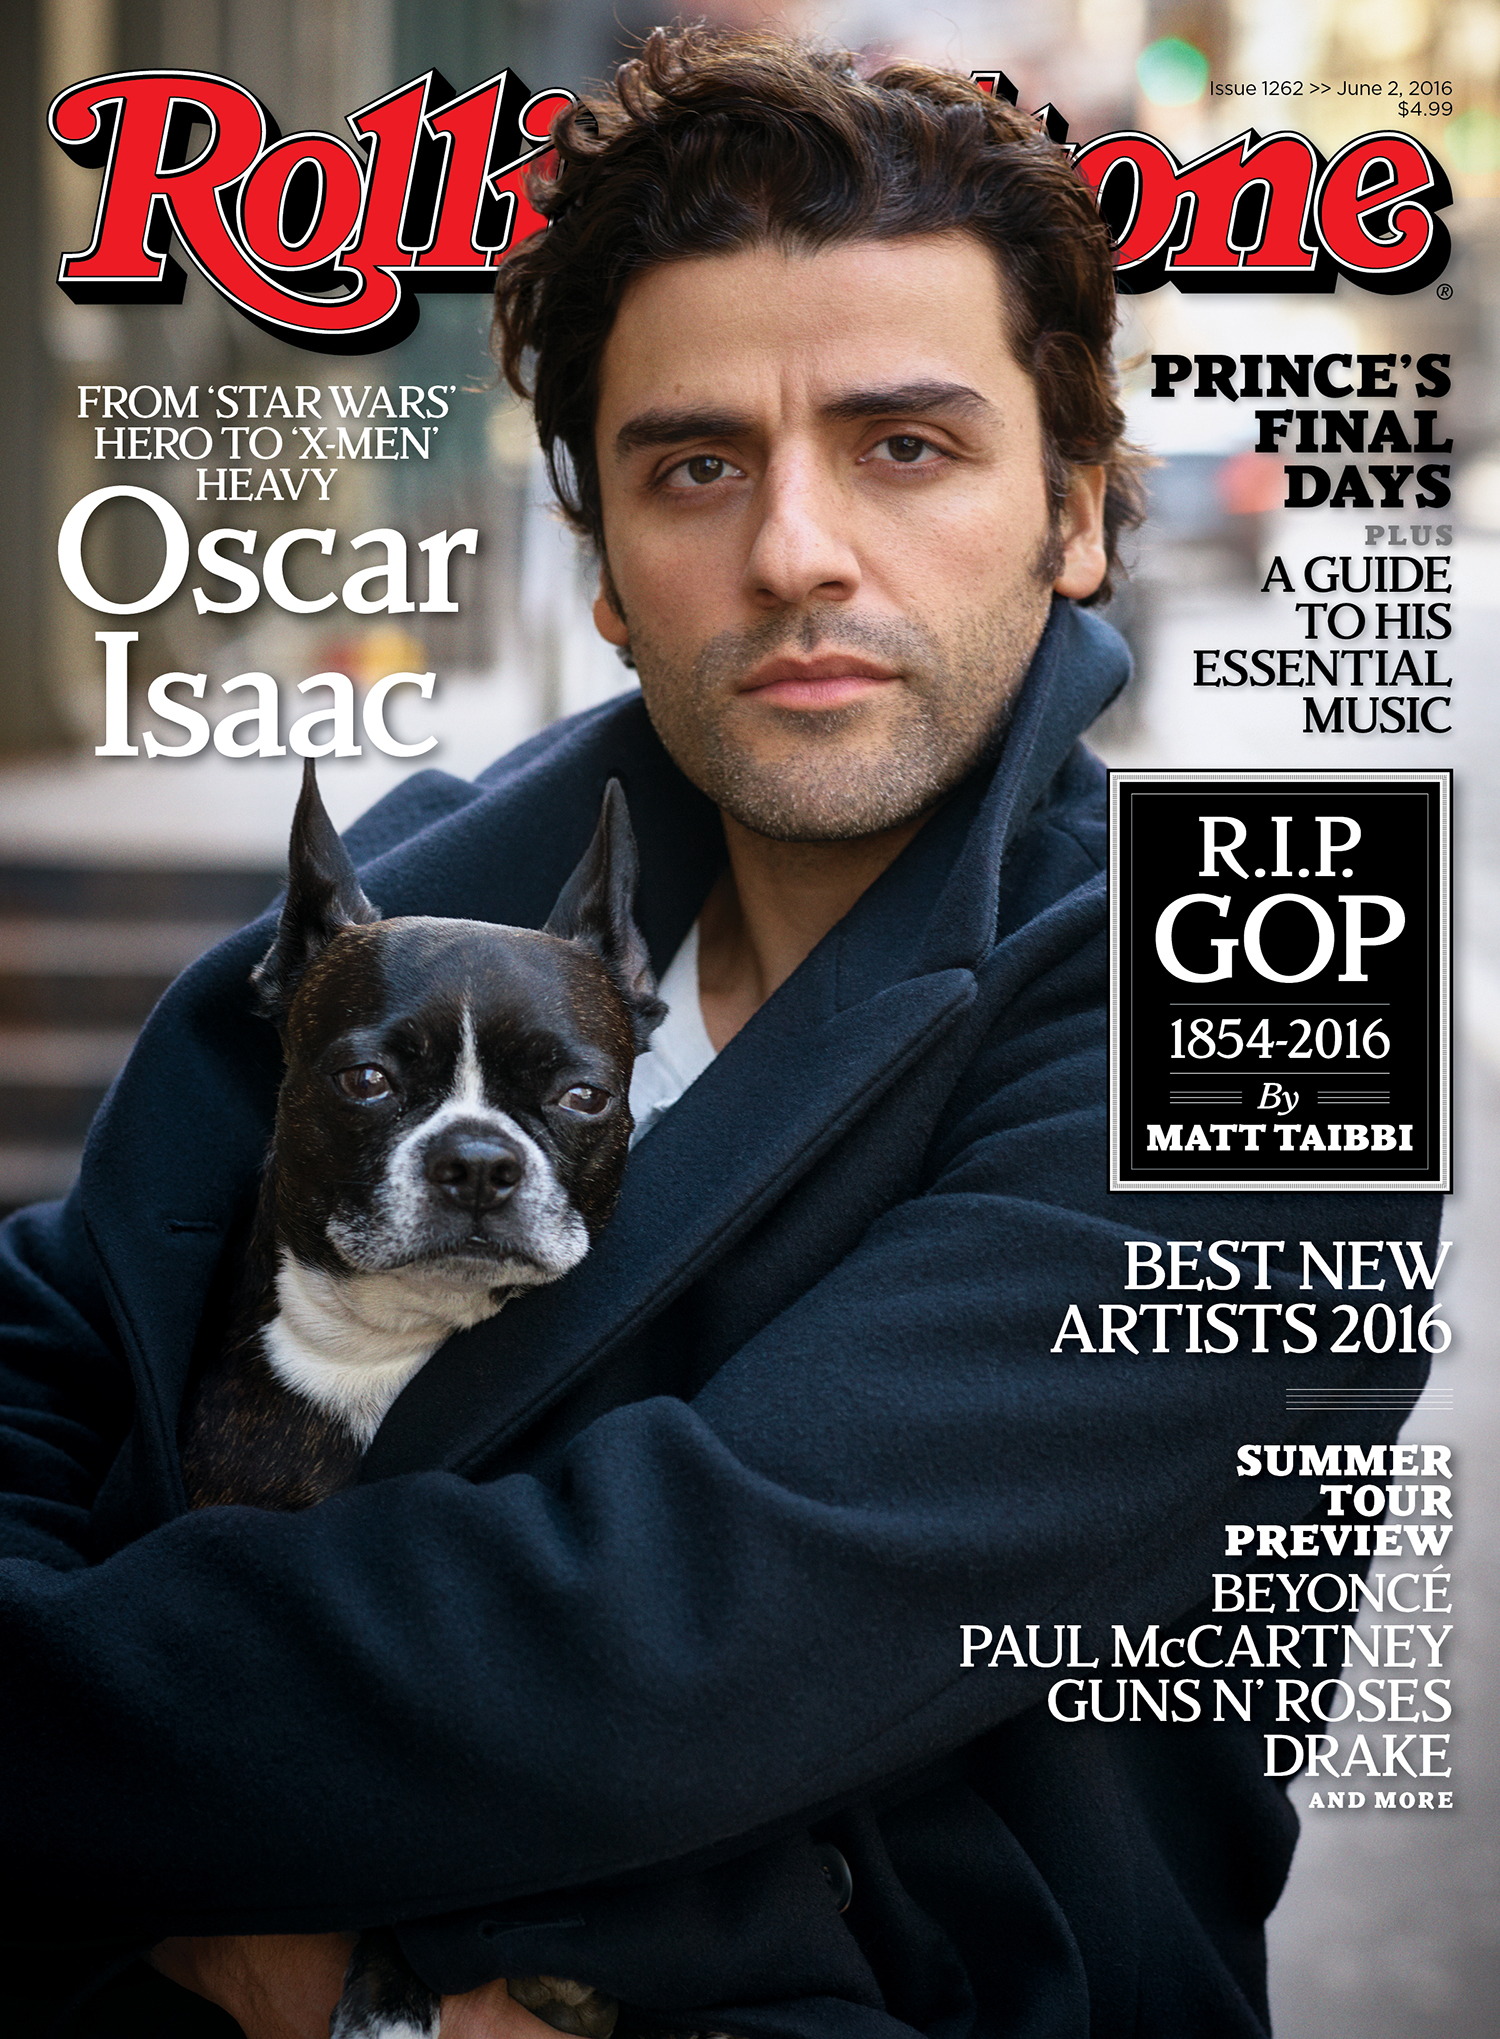 Oscar Isaac: The Internet's Boyfriend Becomes a Leading Man